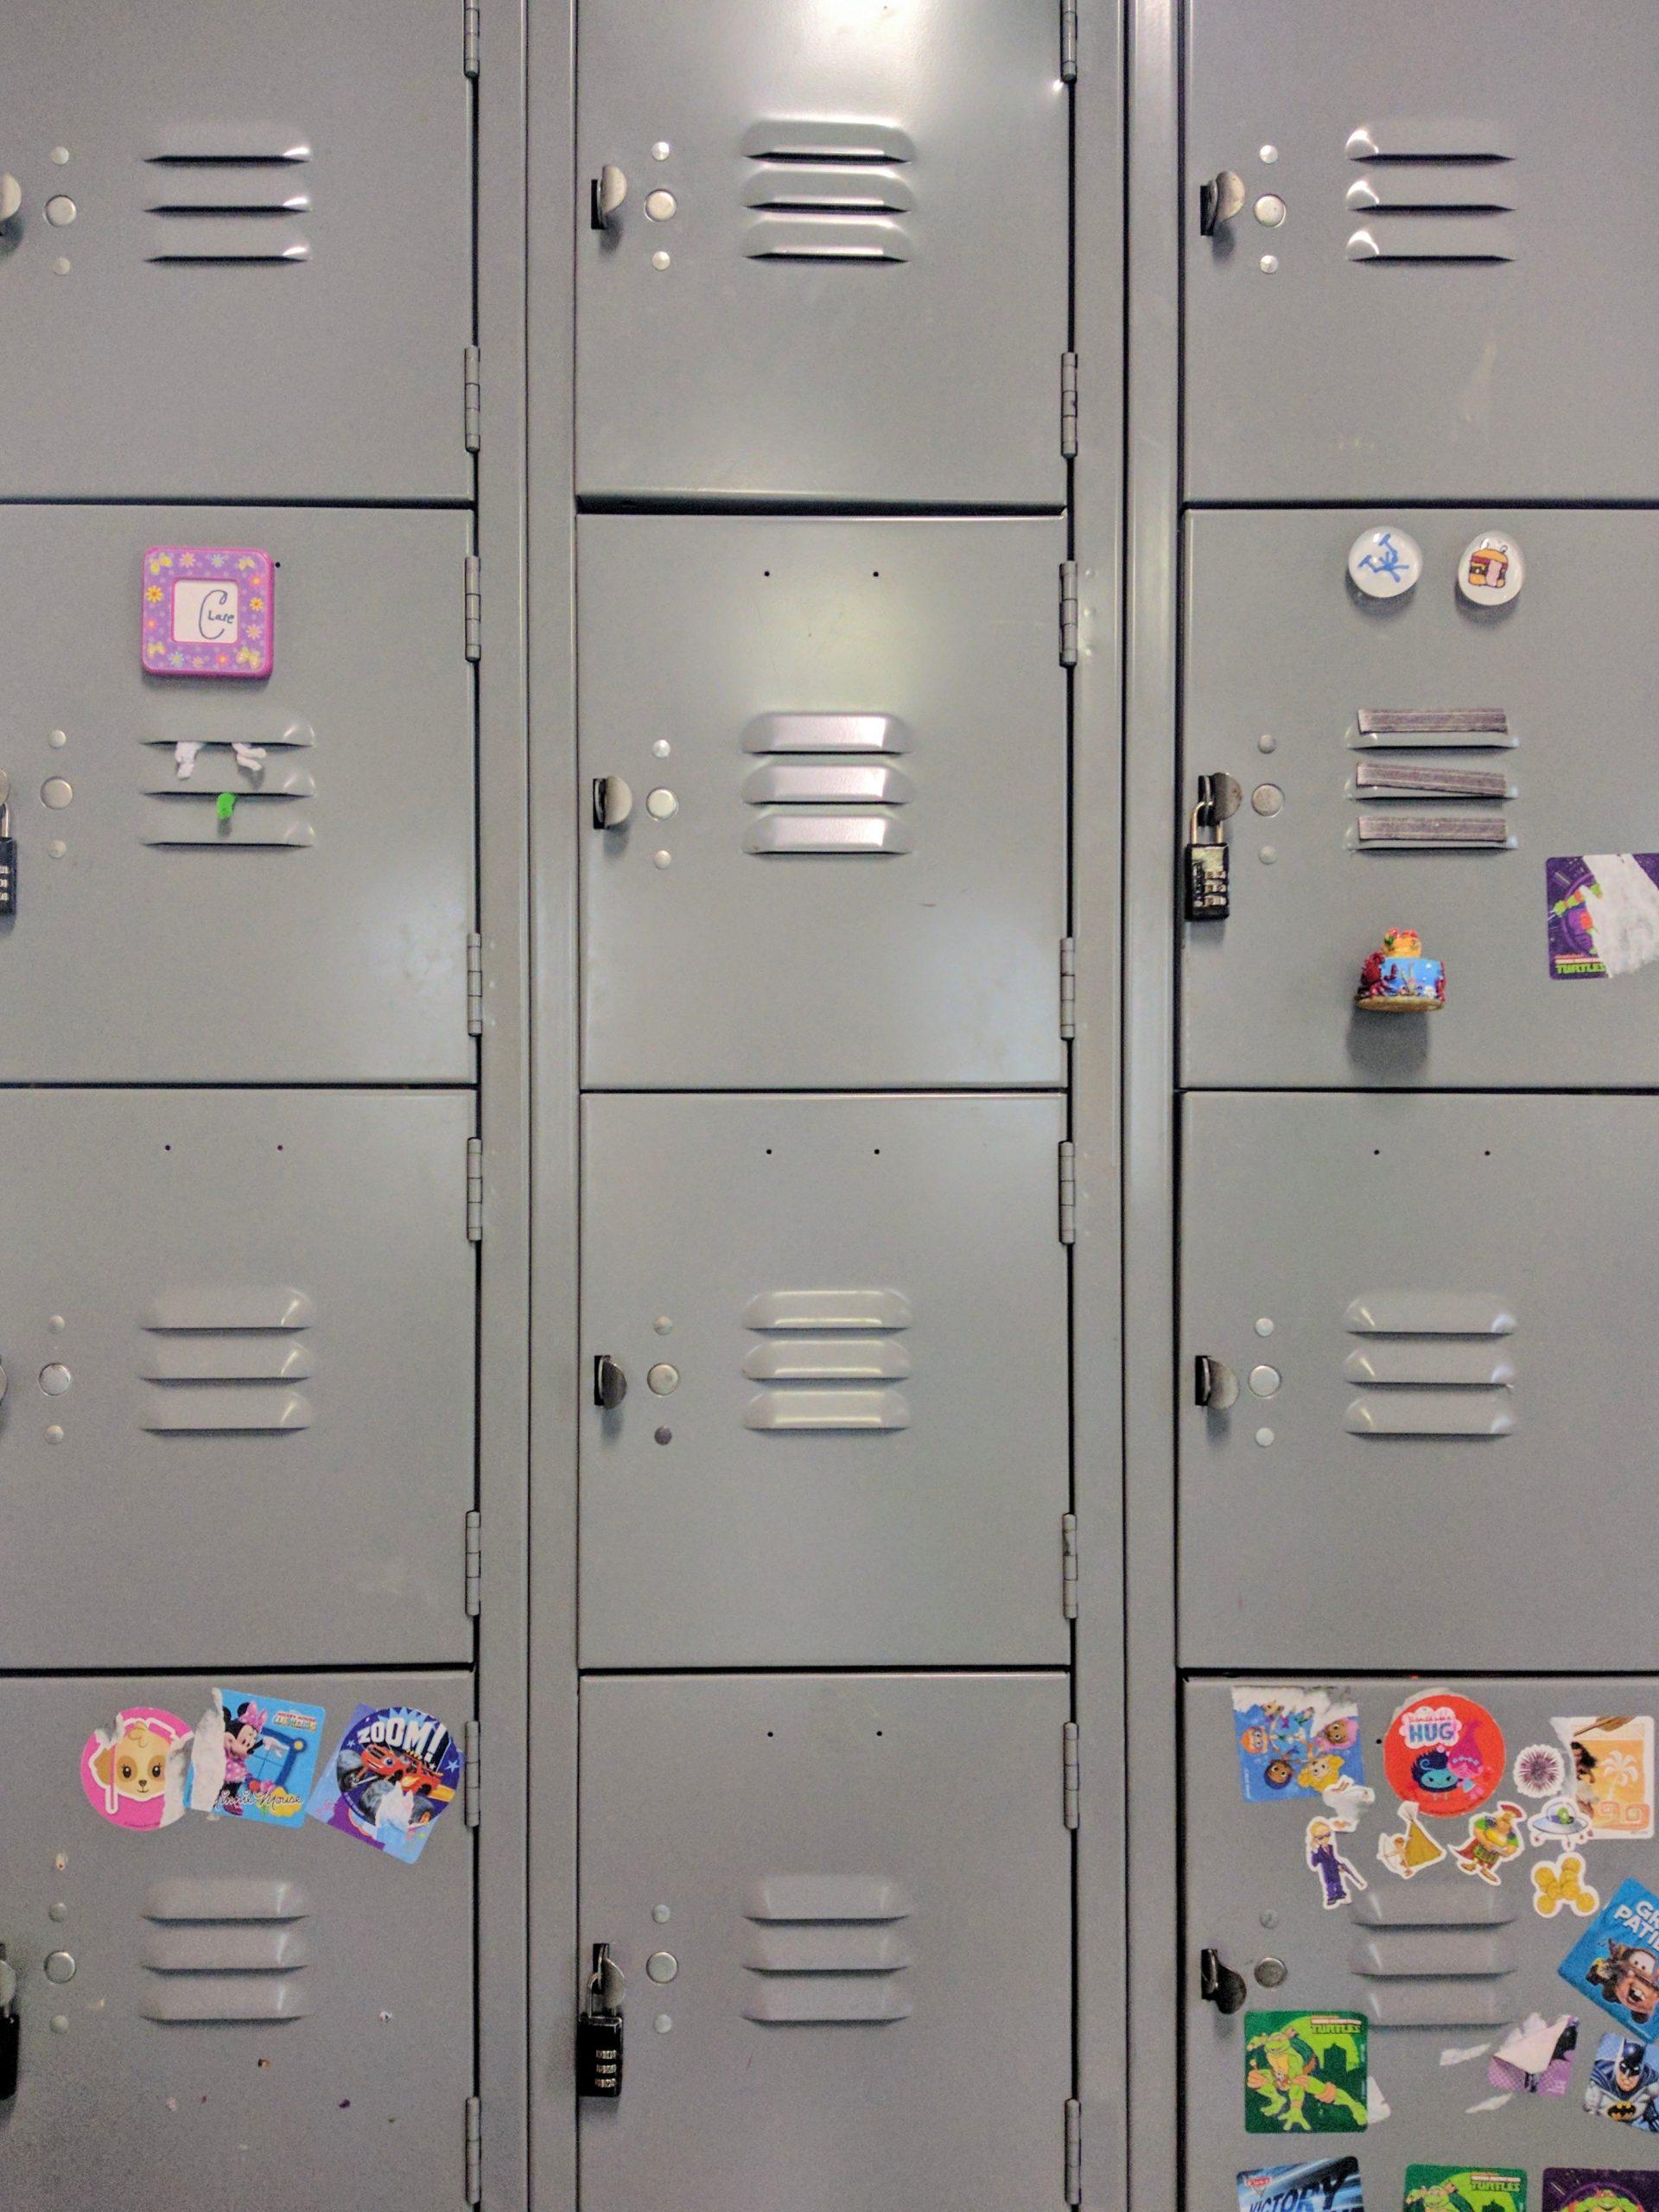 gray steel locker with stickers